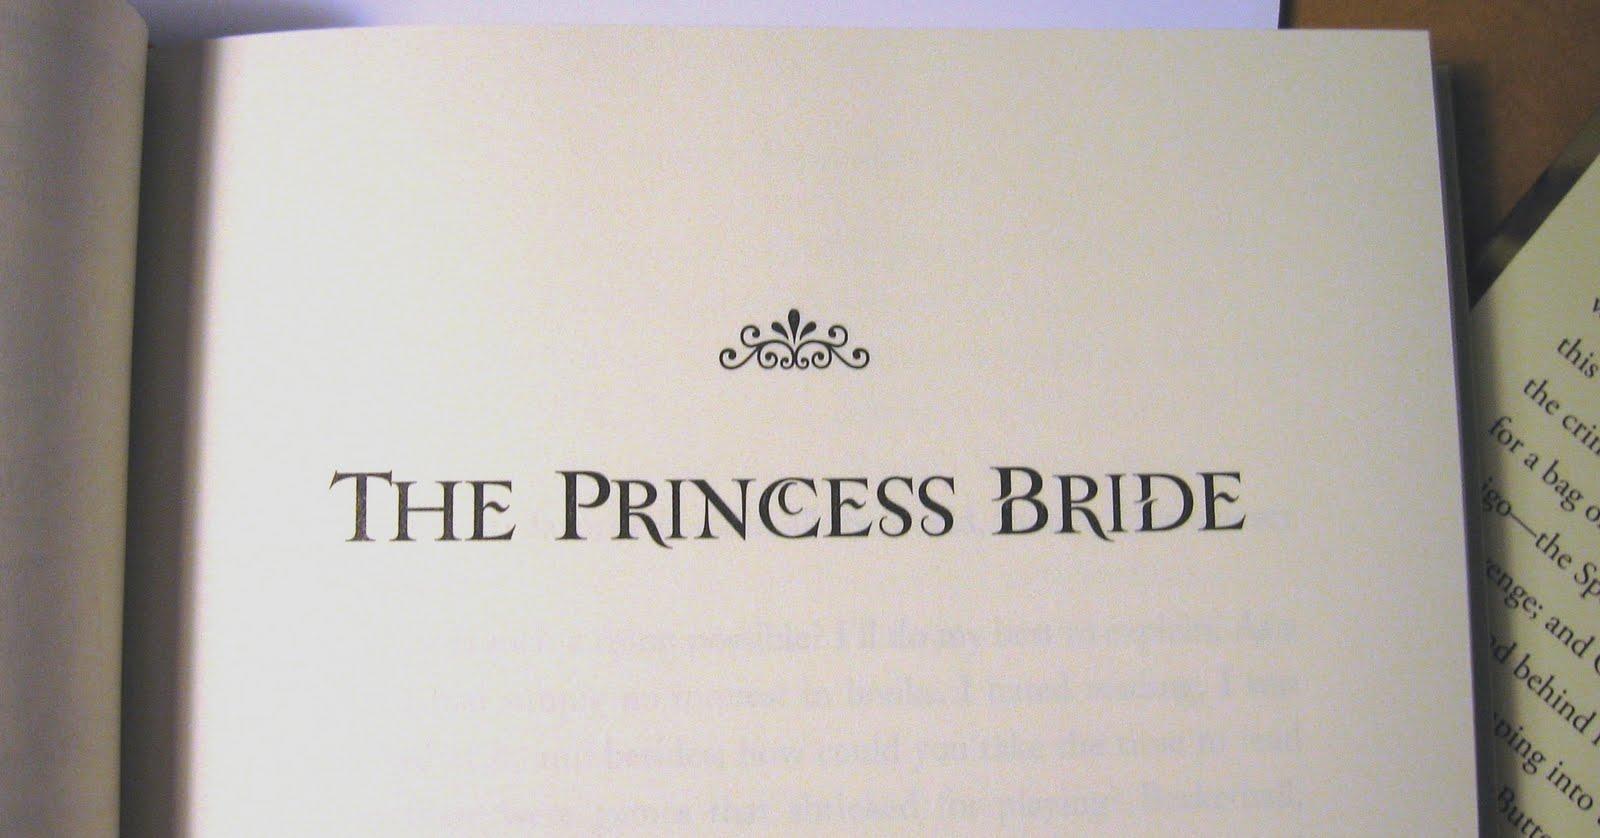 the princess bride essay questions